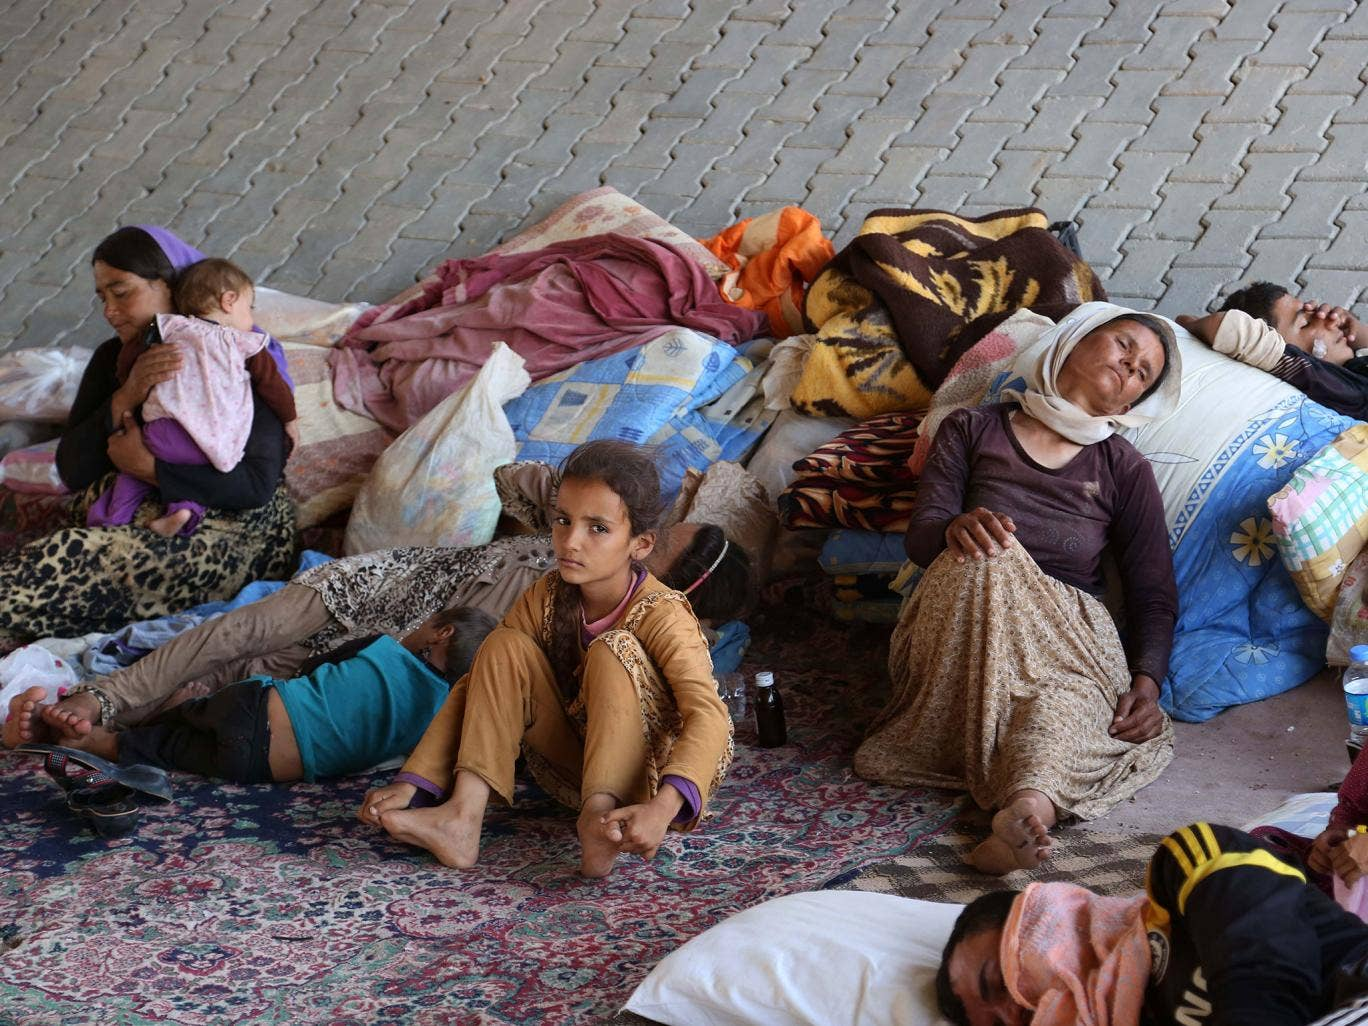 Displaced Iraqis from the Yazidi community settle under a bridge in Dahuk, Iraq